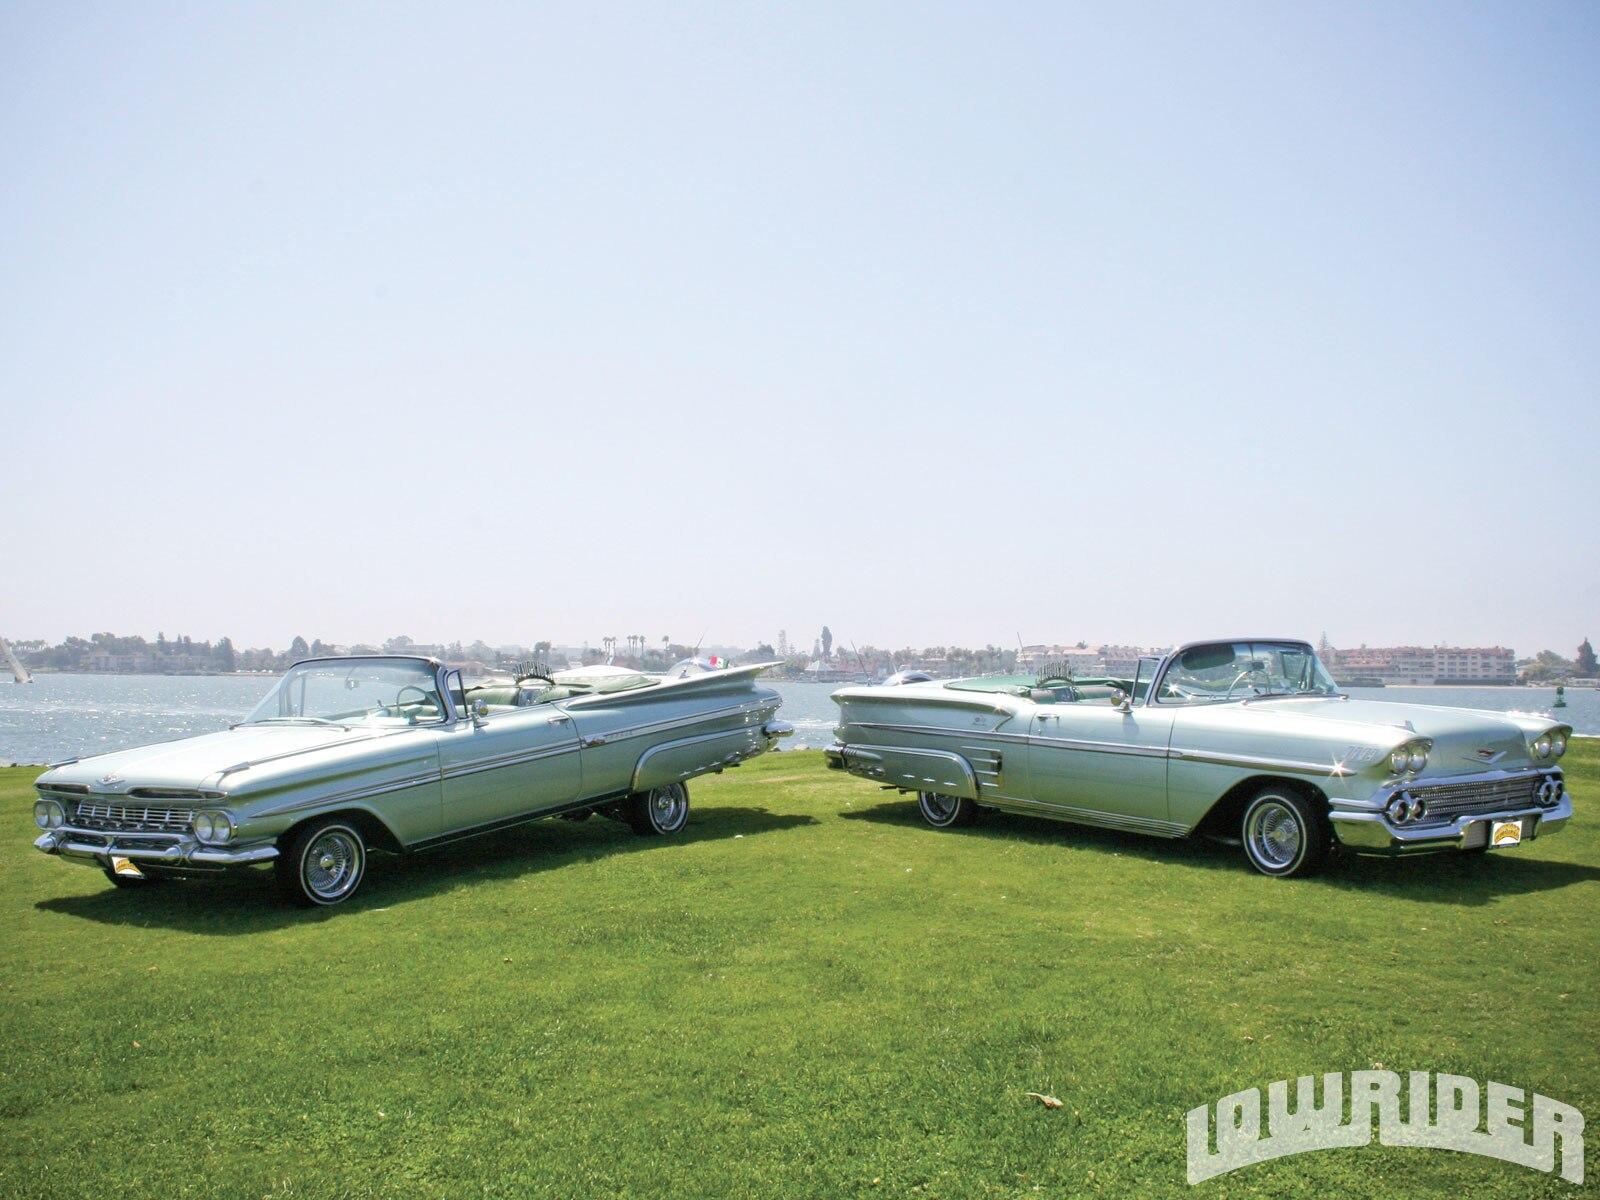 1102-lrmp-05-o-1958-and-1959-chevrolet-impala-convertible-convertibles2